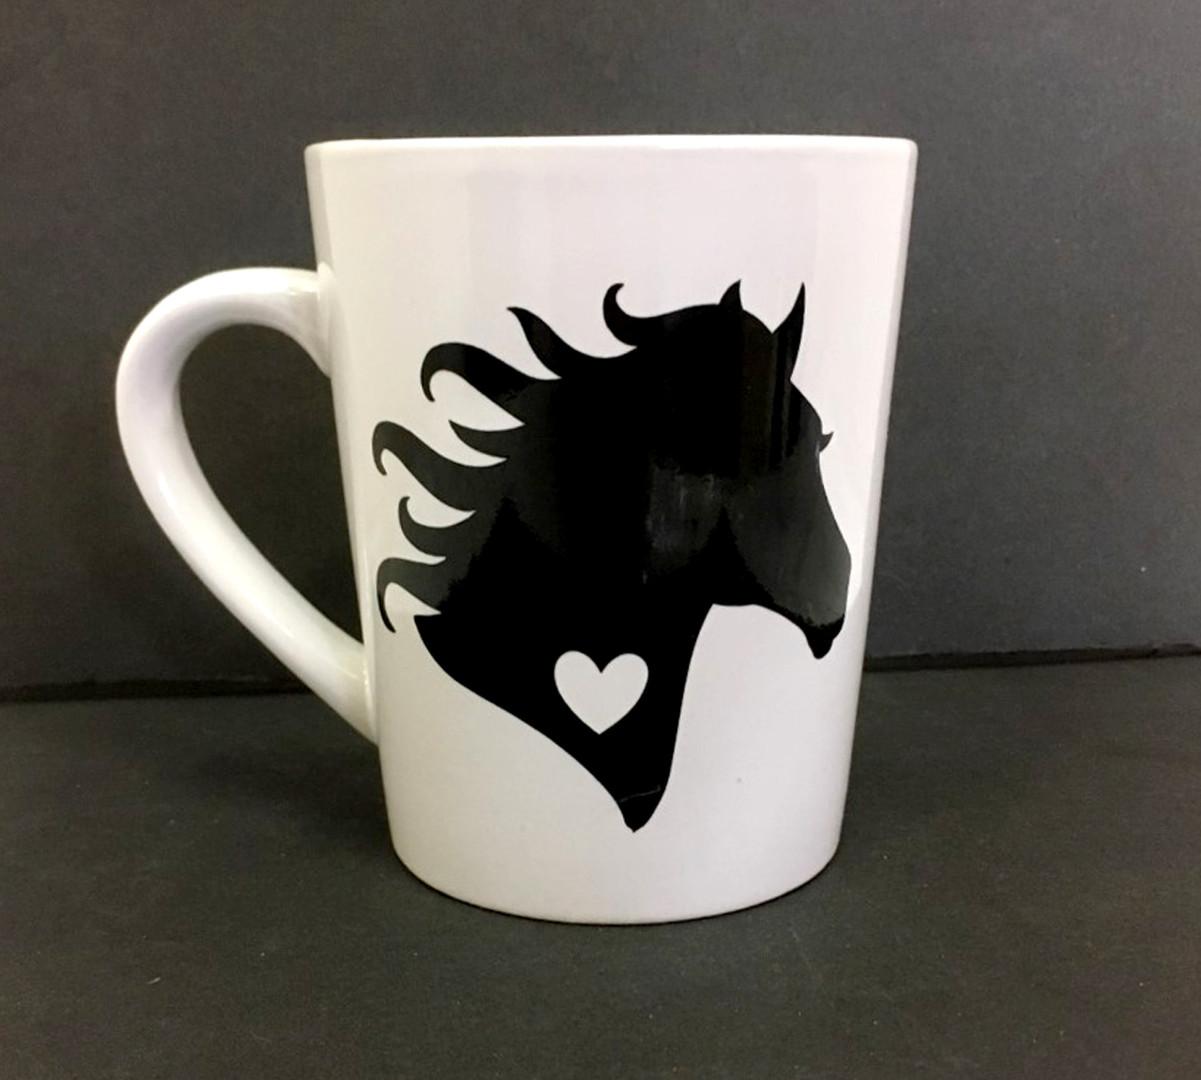 Horse silhouette mug